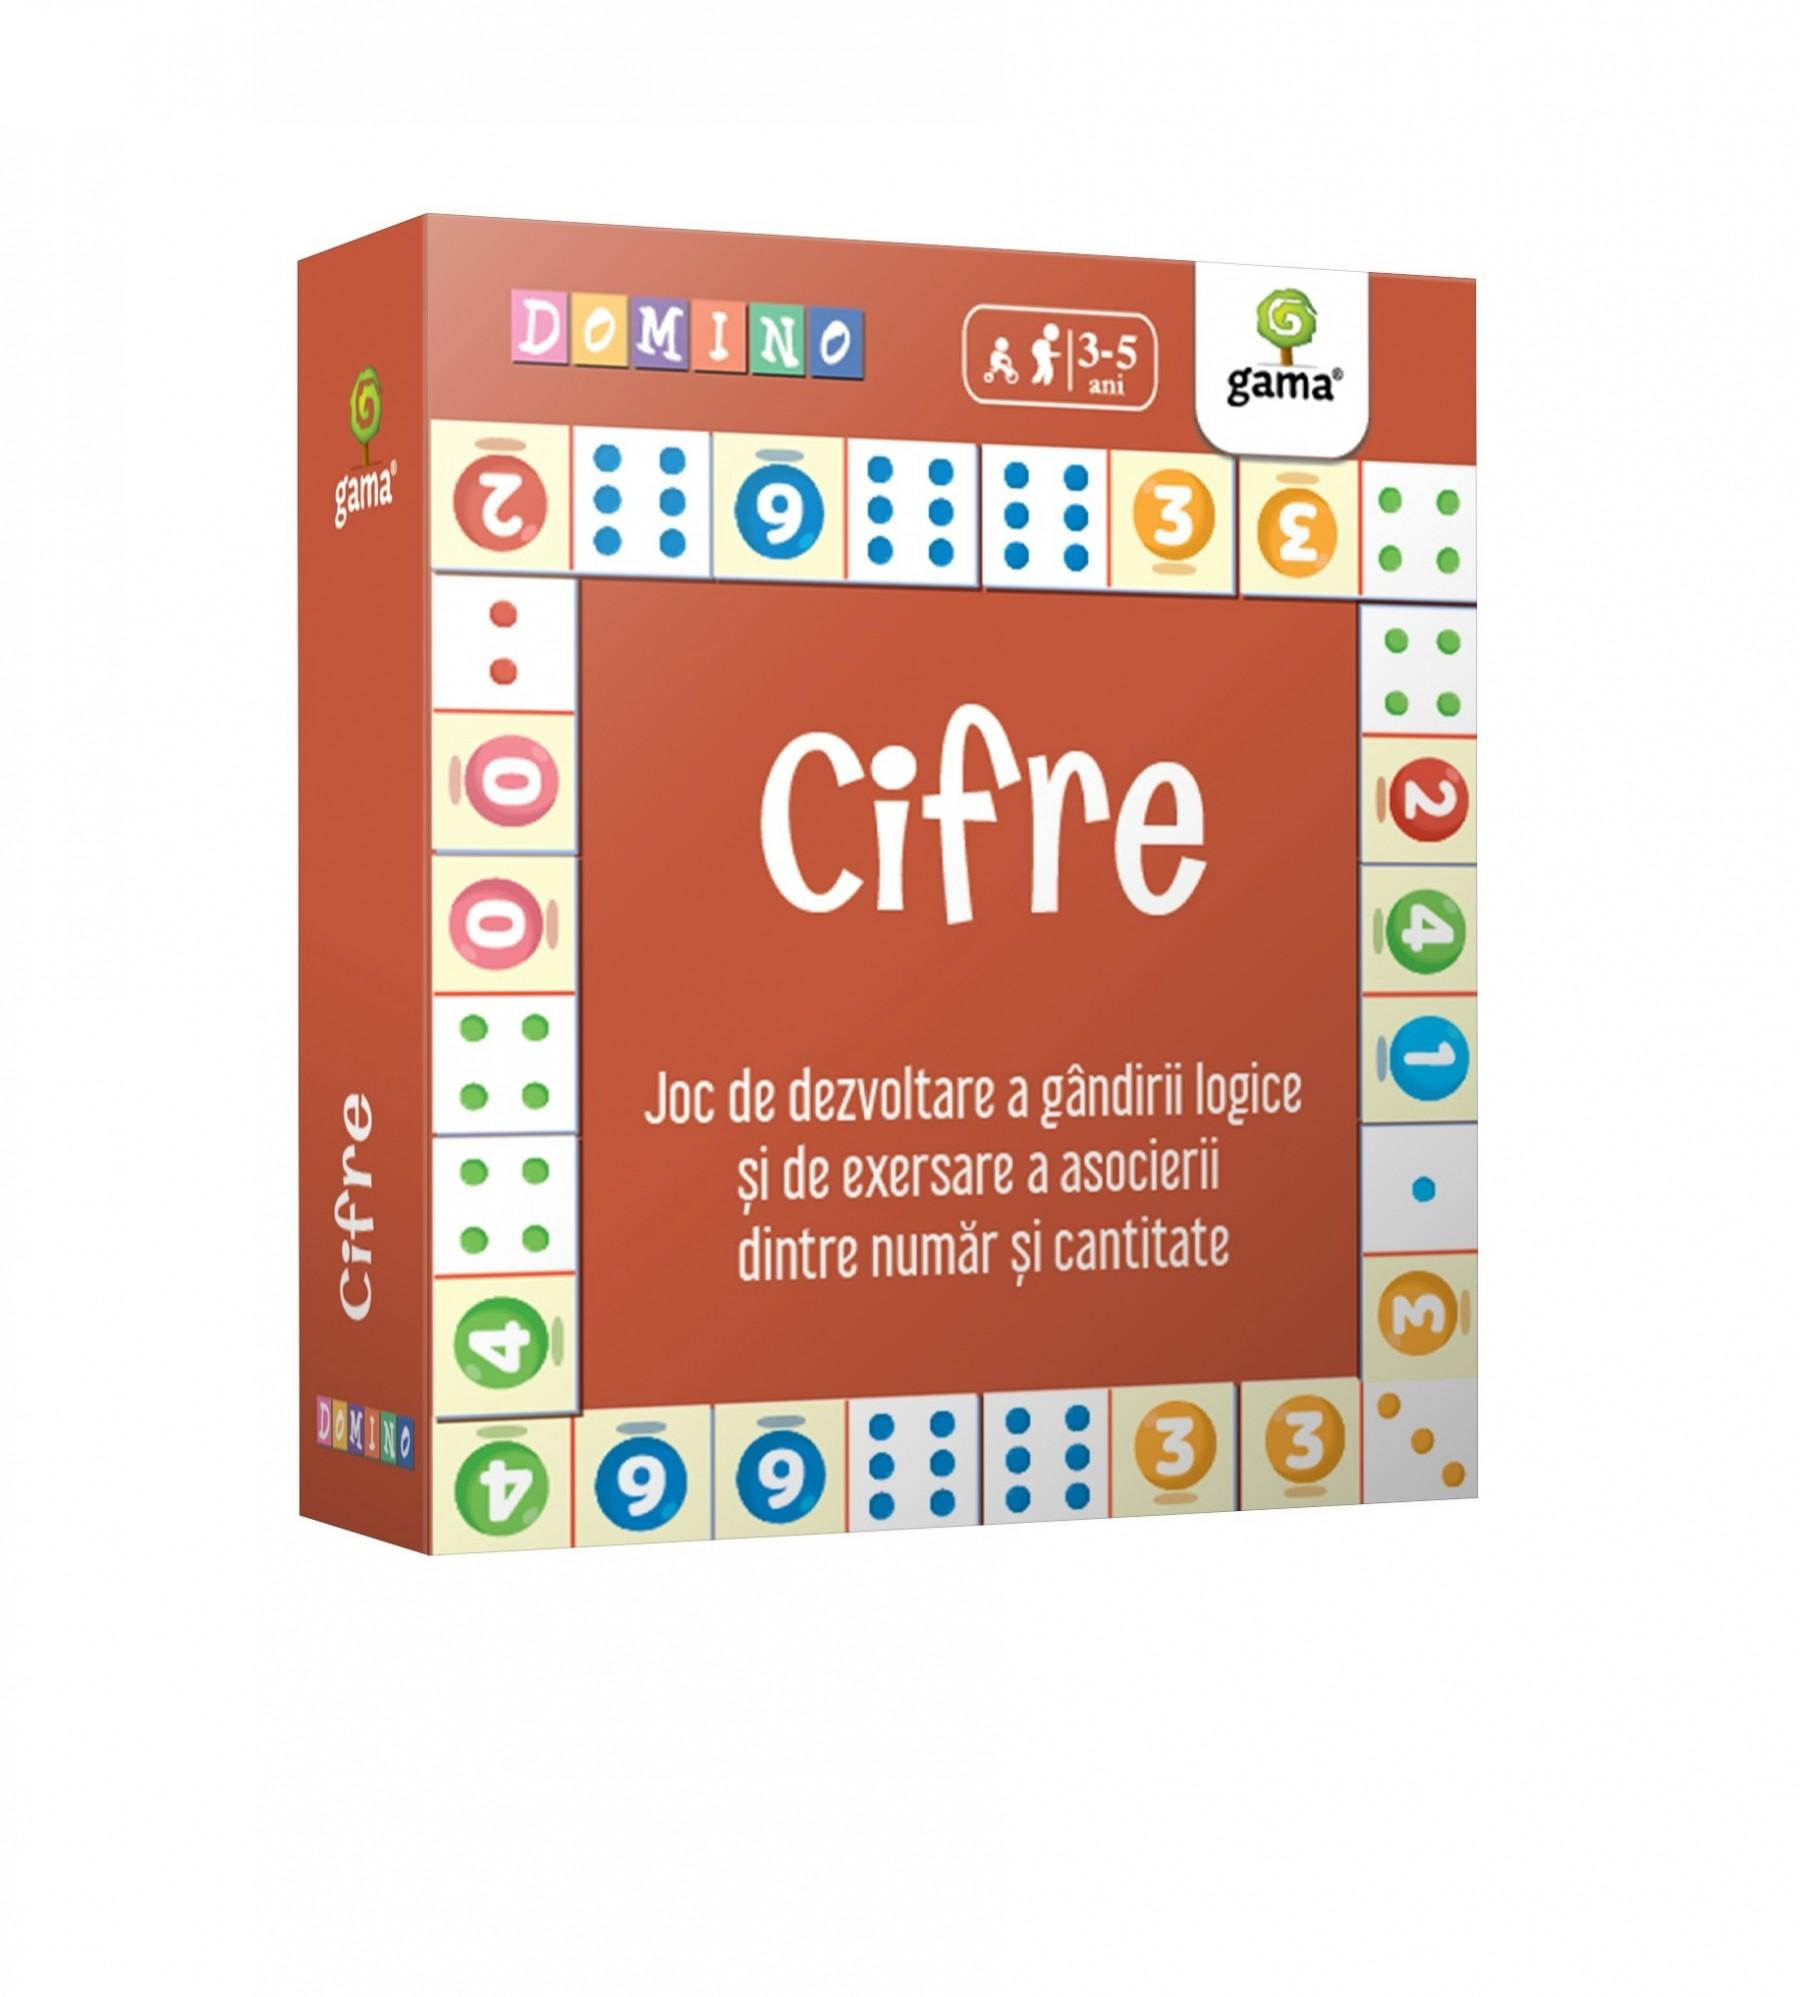 cutie_cifre_domino